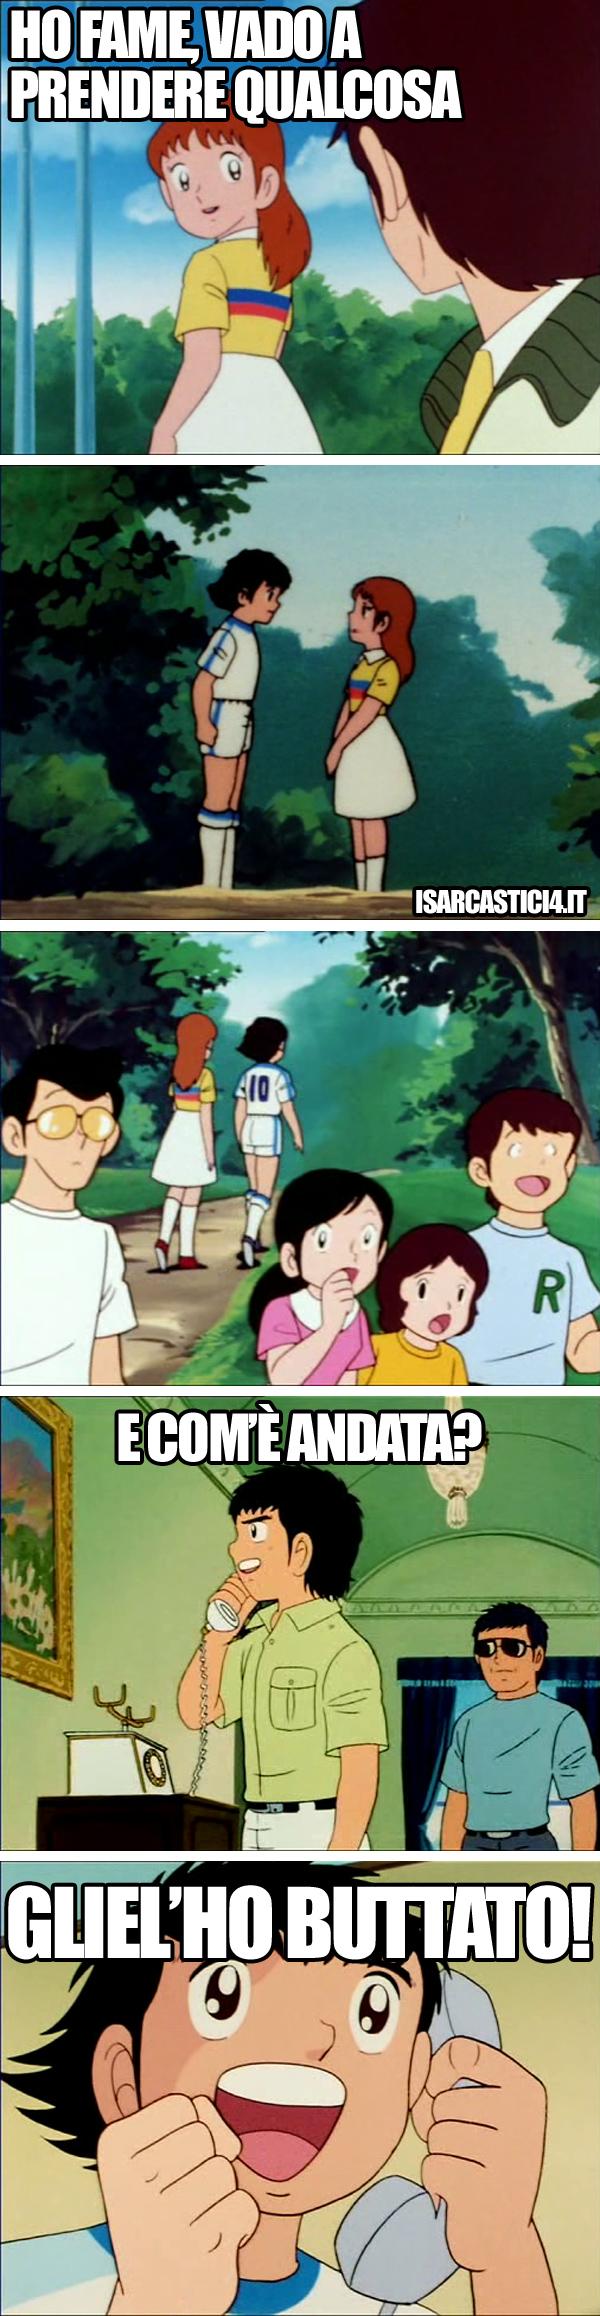 Holly & Benji, Capitan Tsubasa meme ita - L'amore è una cosa semplice